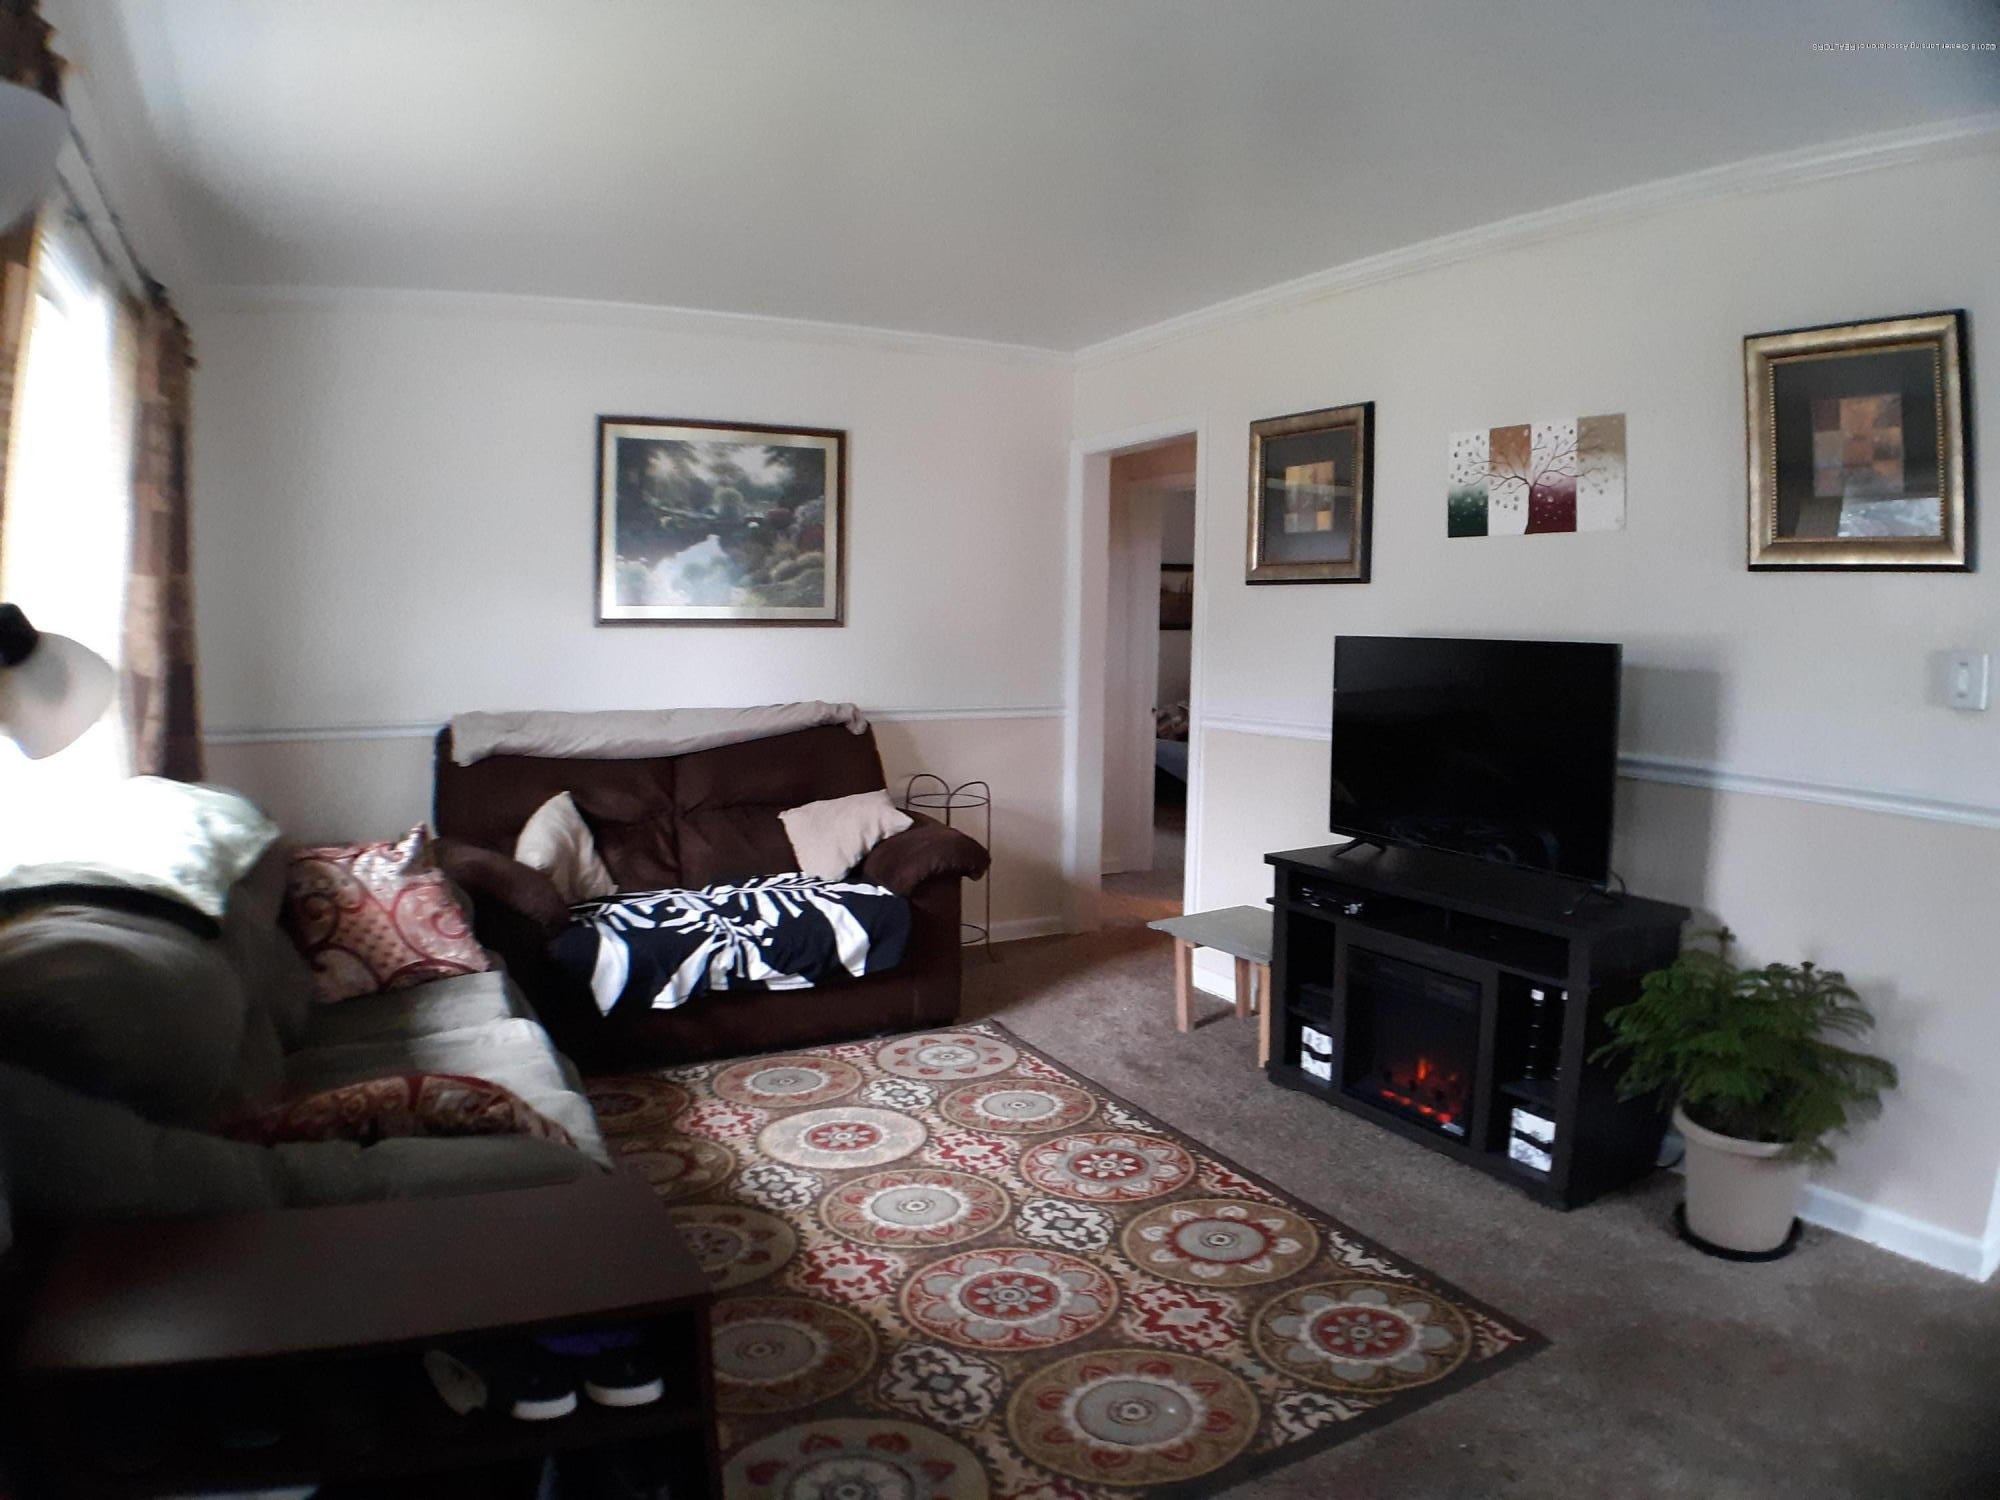 1718 Victor Ave - 1718 livingroom - 2